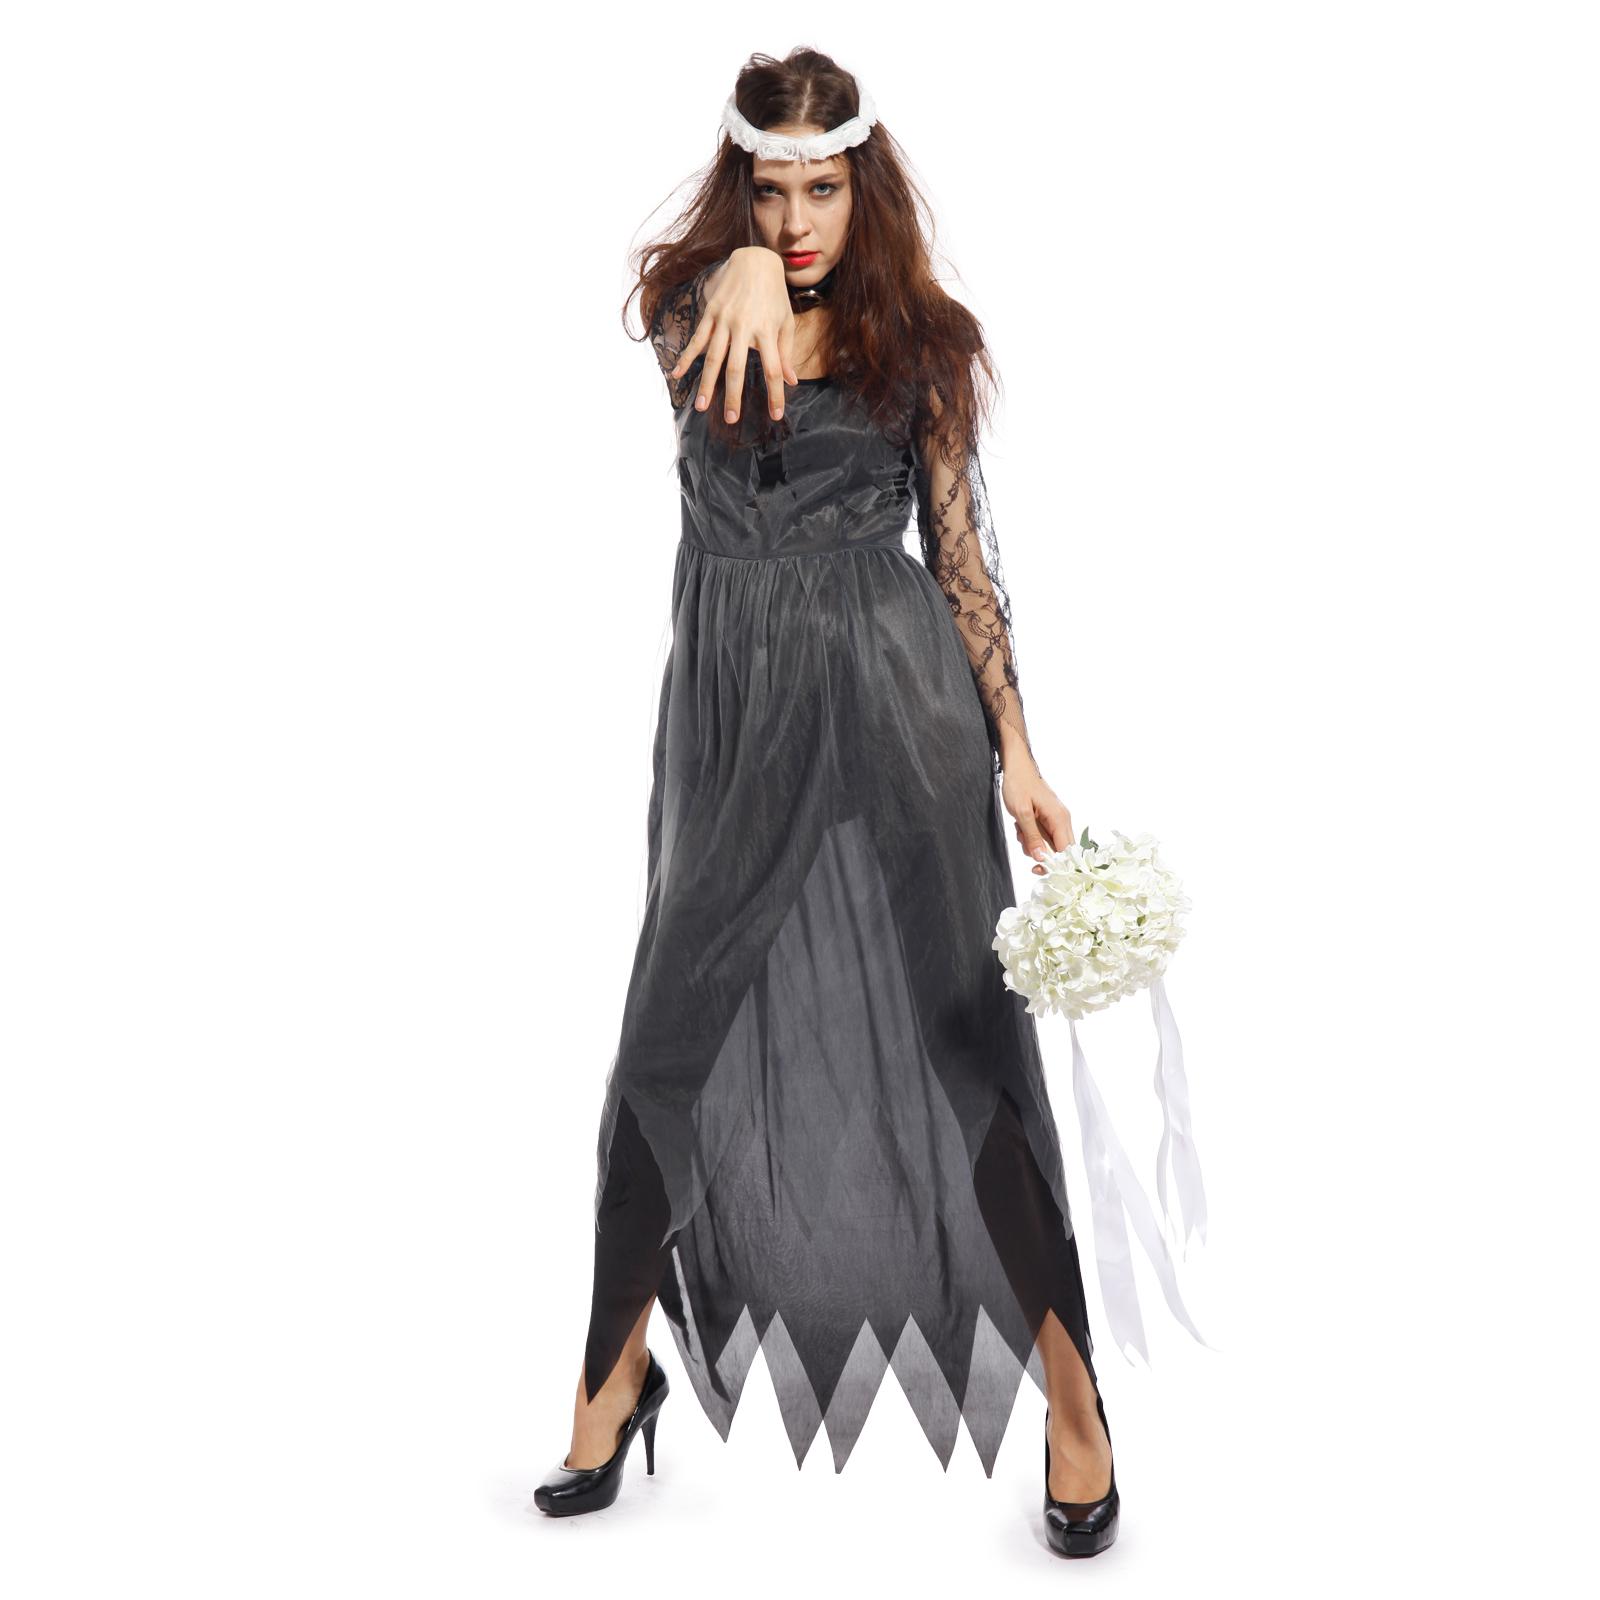 Ladies Halloween Zombie Corpse Bride Fancy Dress Costume